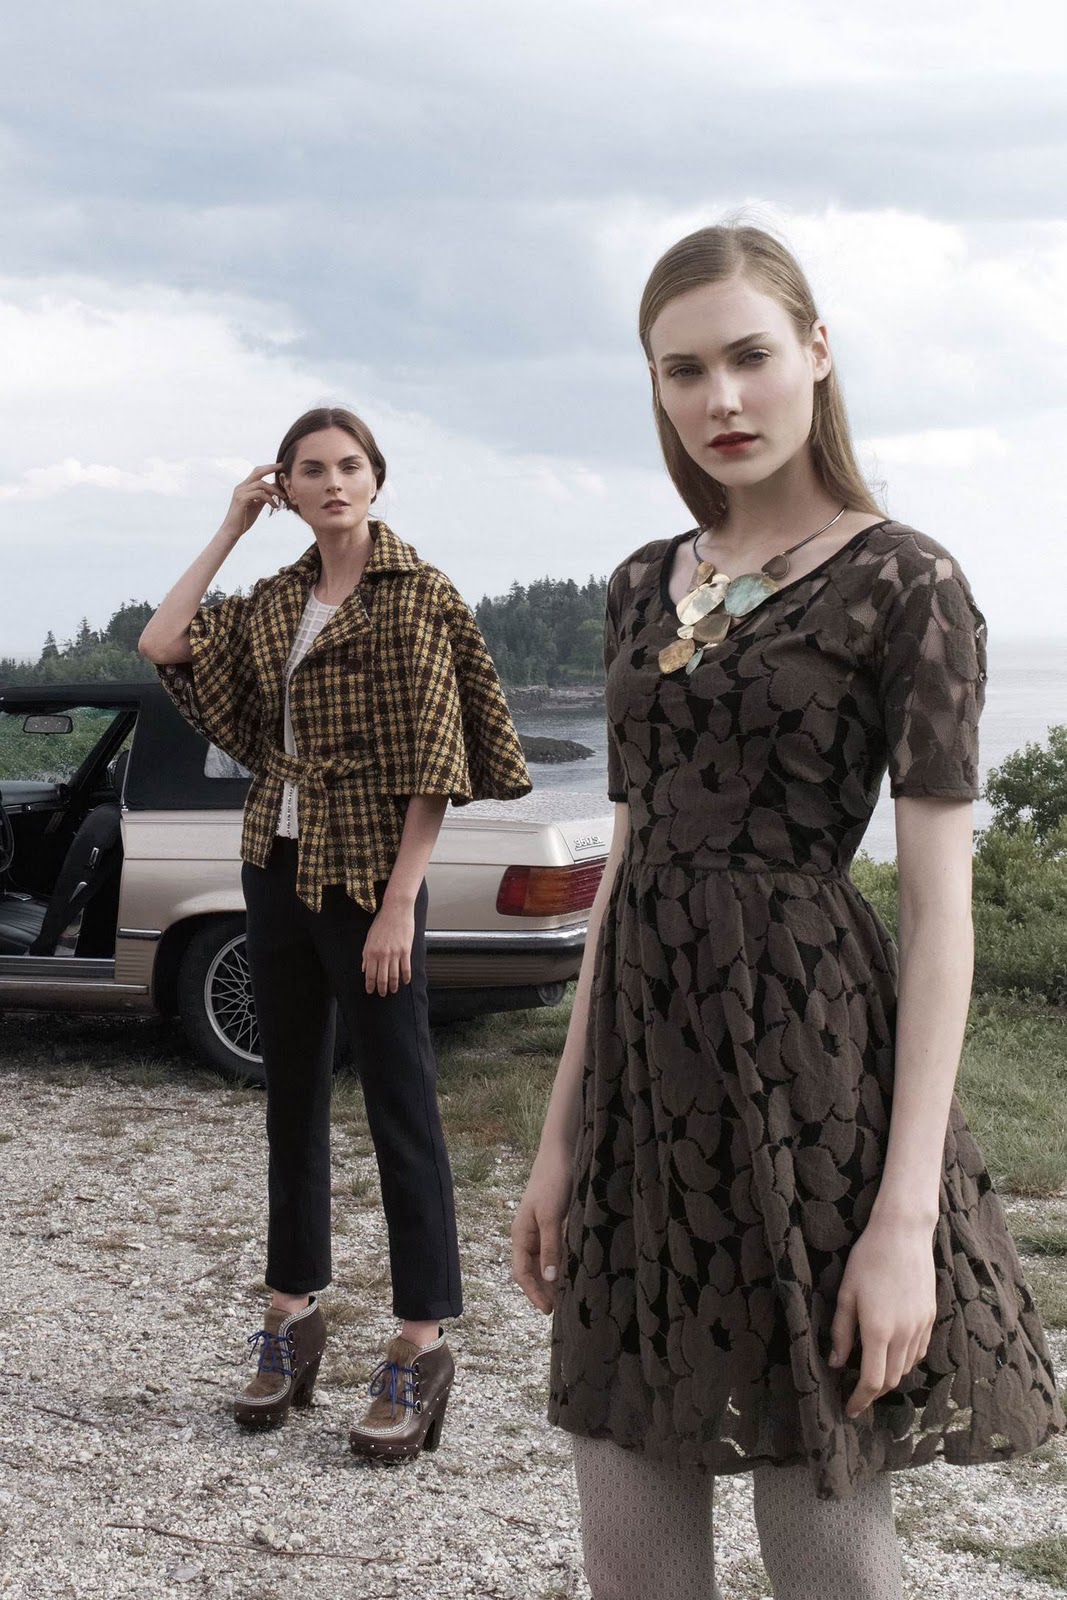 928d45ca97c3 Reviews: Interspersed Ponte Dress, Veiled Alder Dress, Adelaide Dress, Painted  Plaid Dress, Eleonora Flight Shift, Unconditional Osier Dress, Girls From  ...